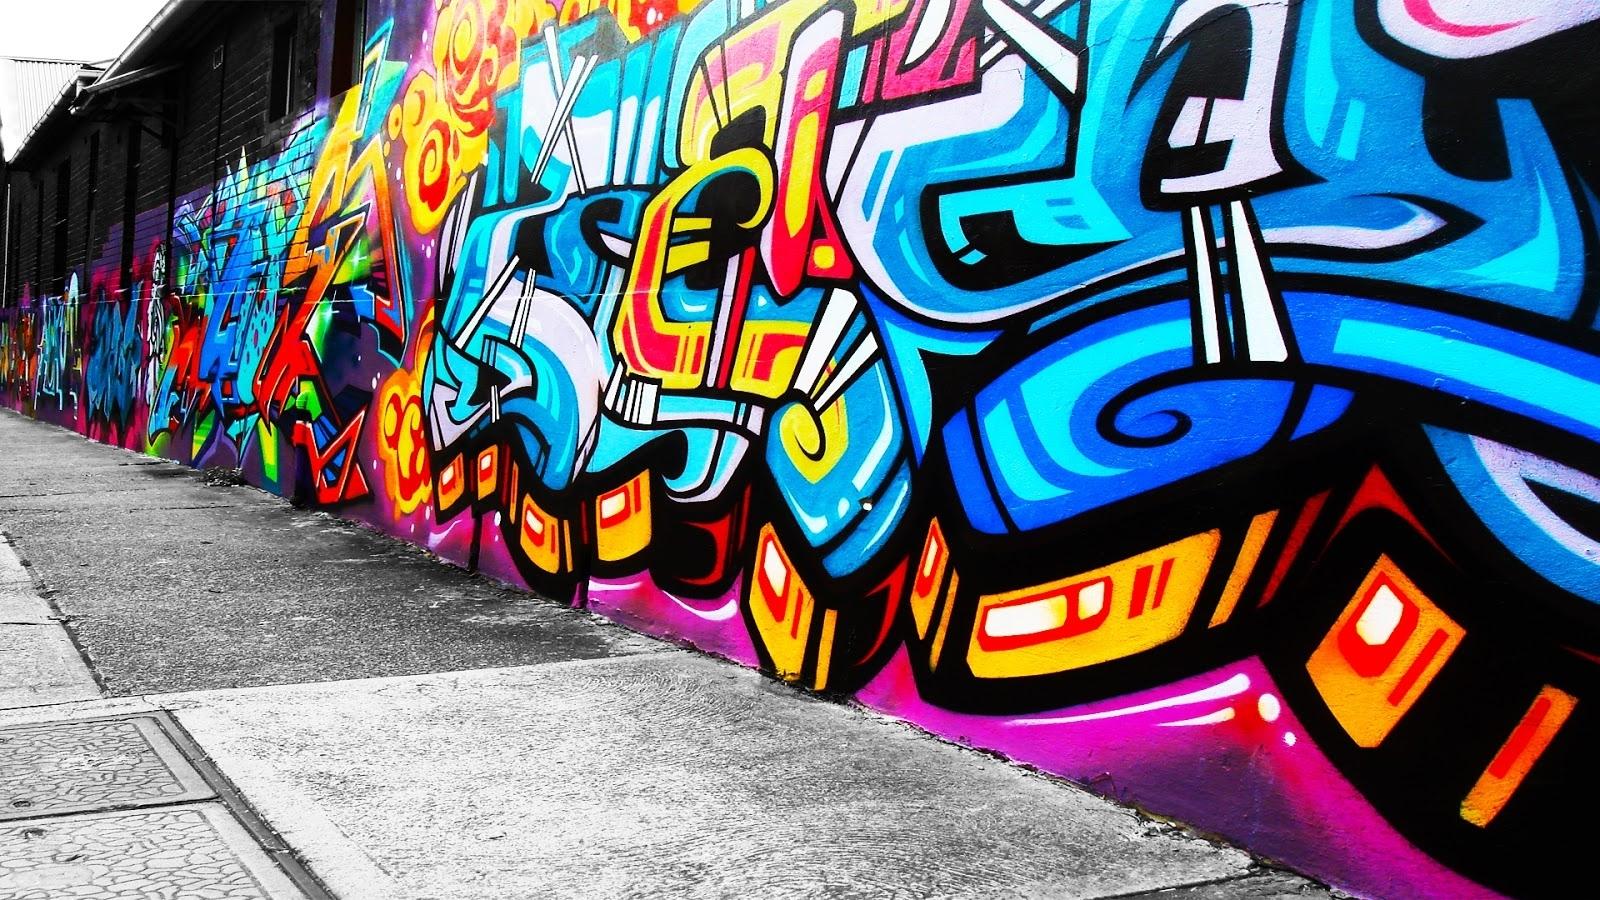 Latest Hip Hop Wall Art Intended For Street Hip Hop Art Backgrounds Hip Hop Wallpaper Saxony, Hip Hop (View 11 of 15)